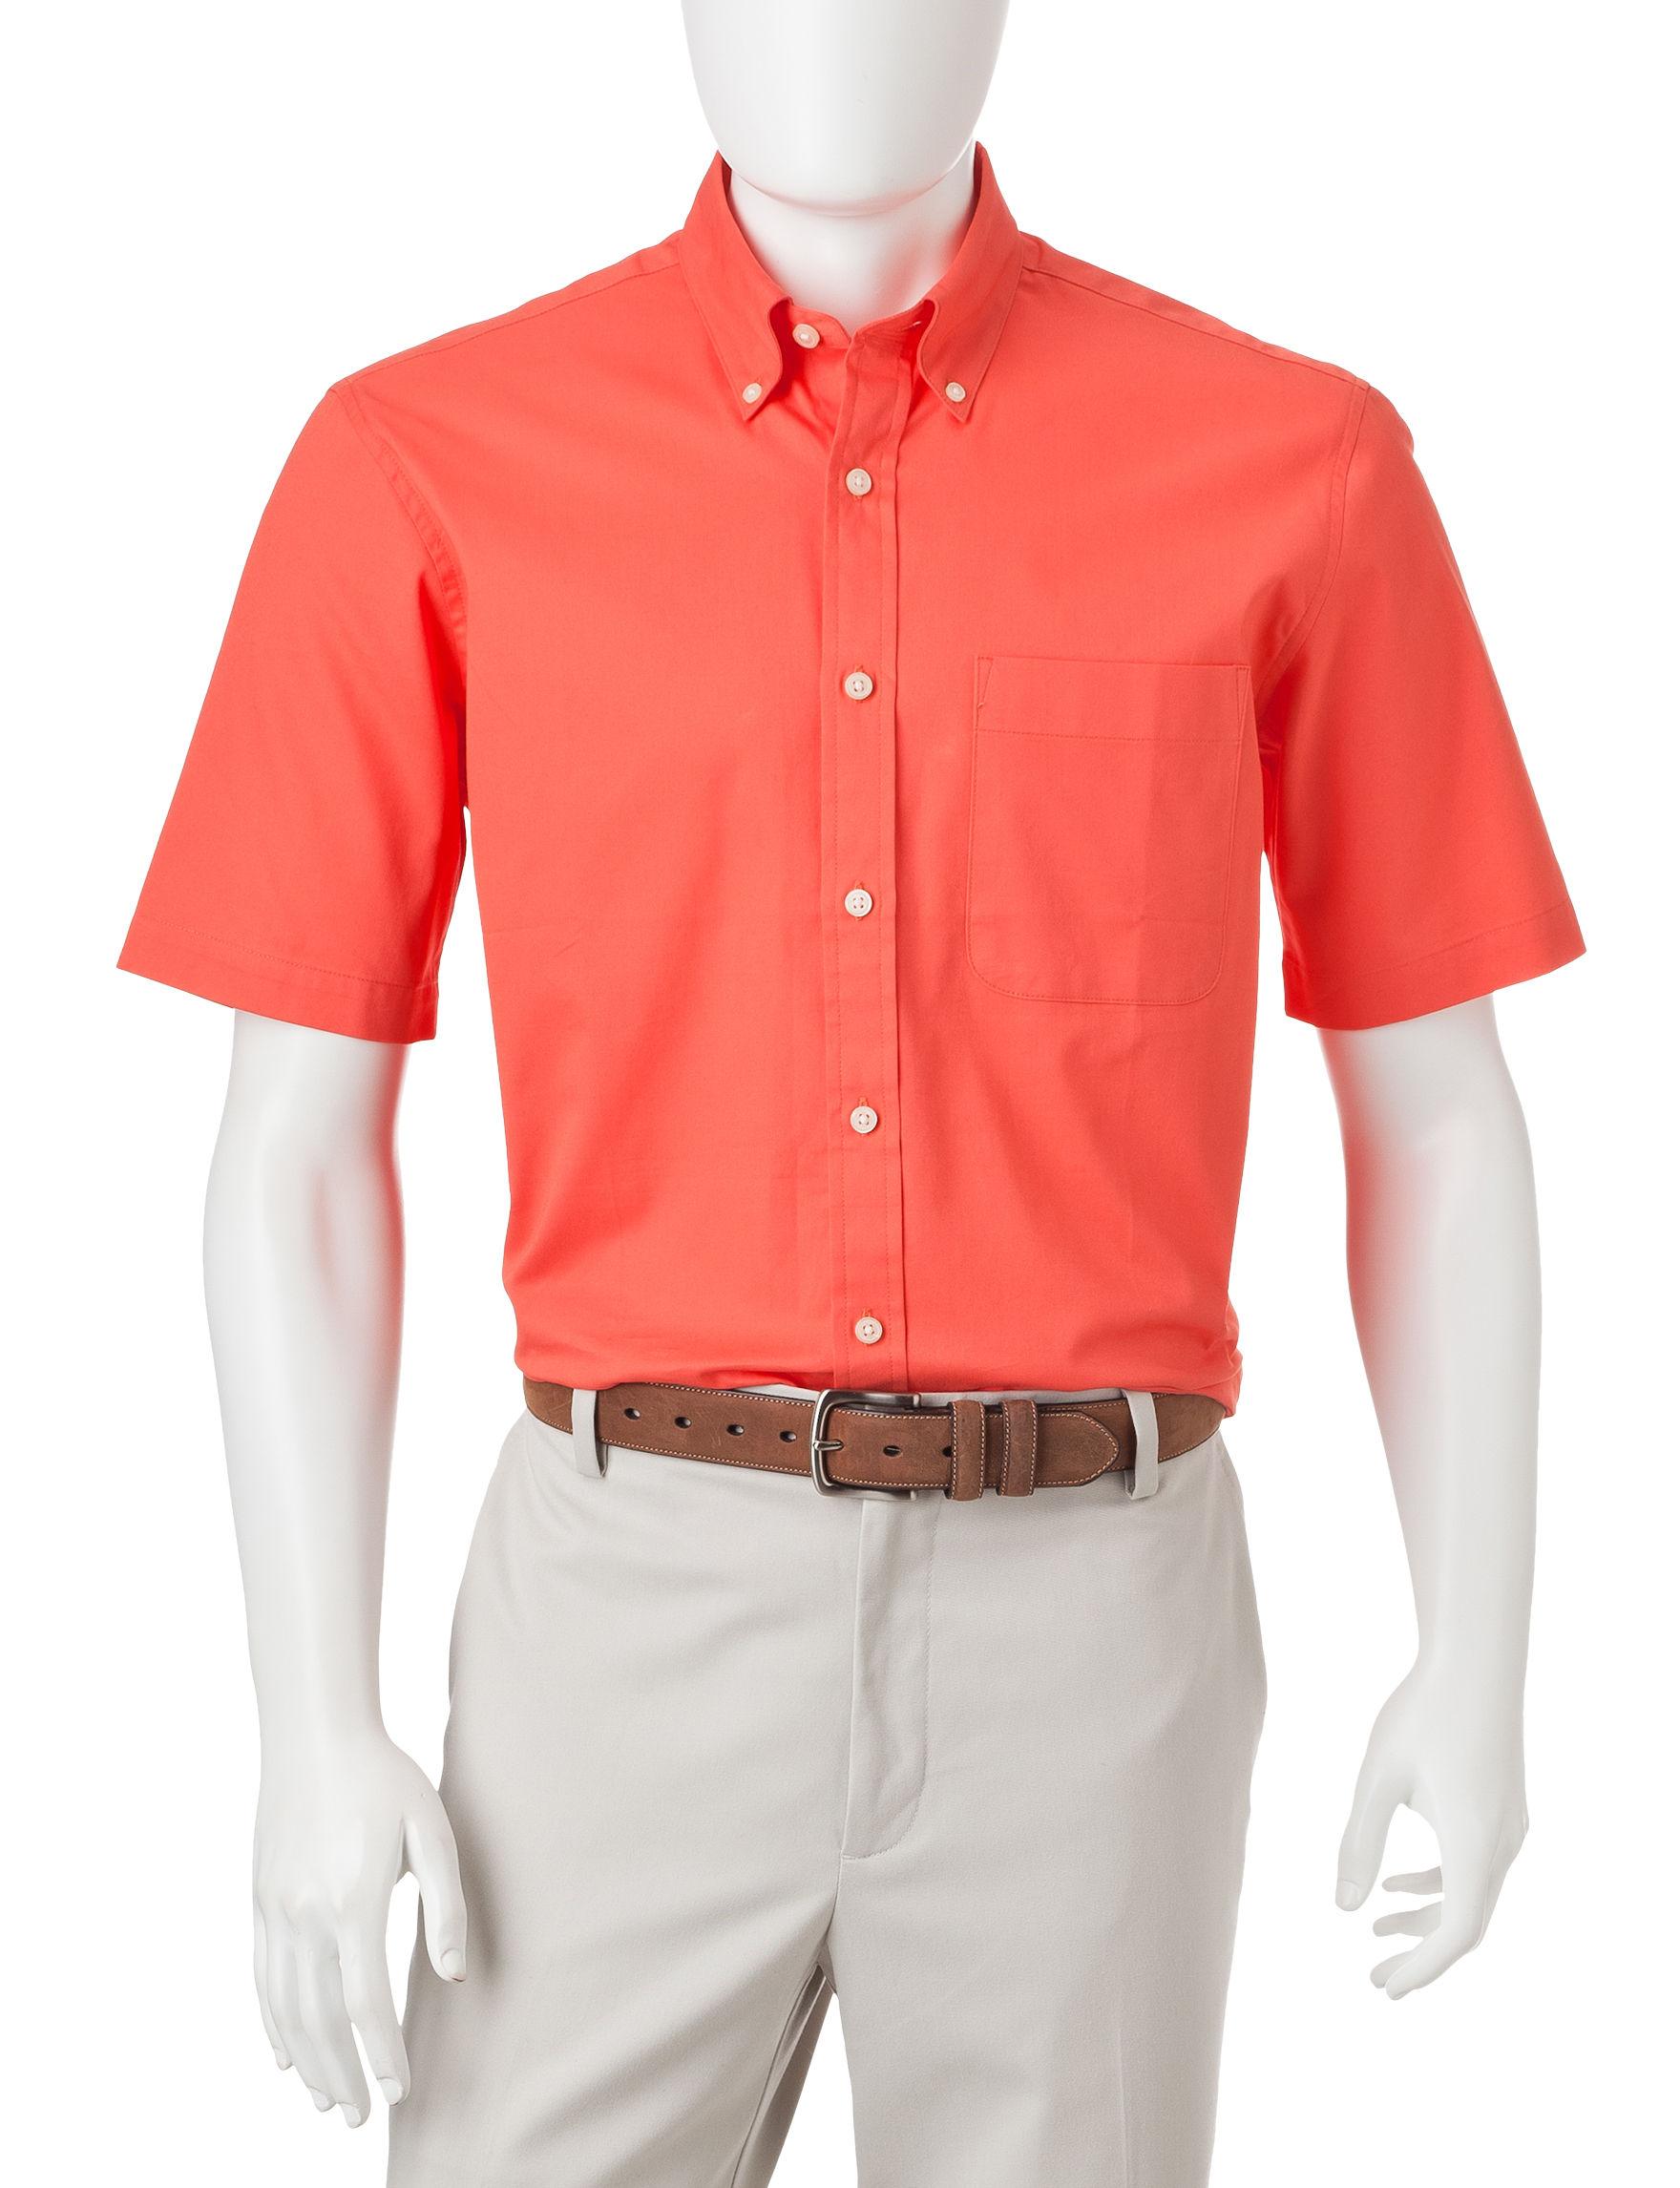 Sun River Salmon Creek Casual Button Down Shirts